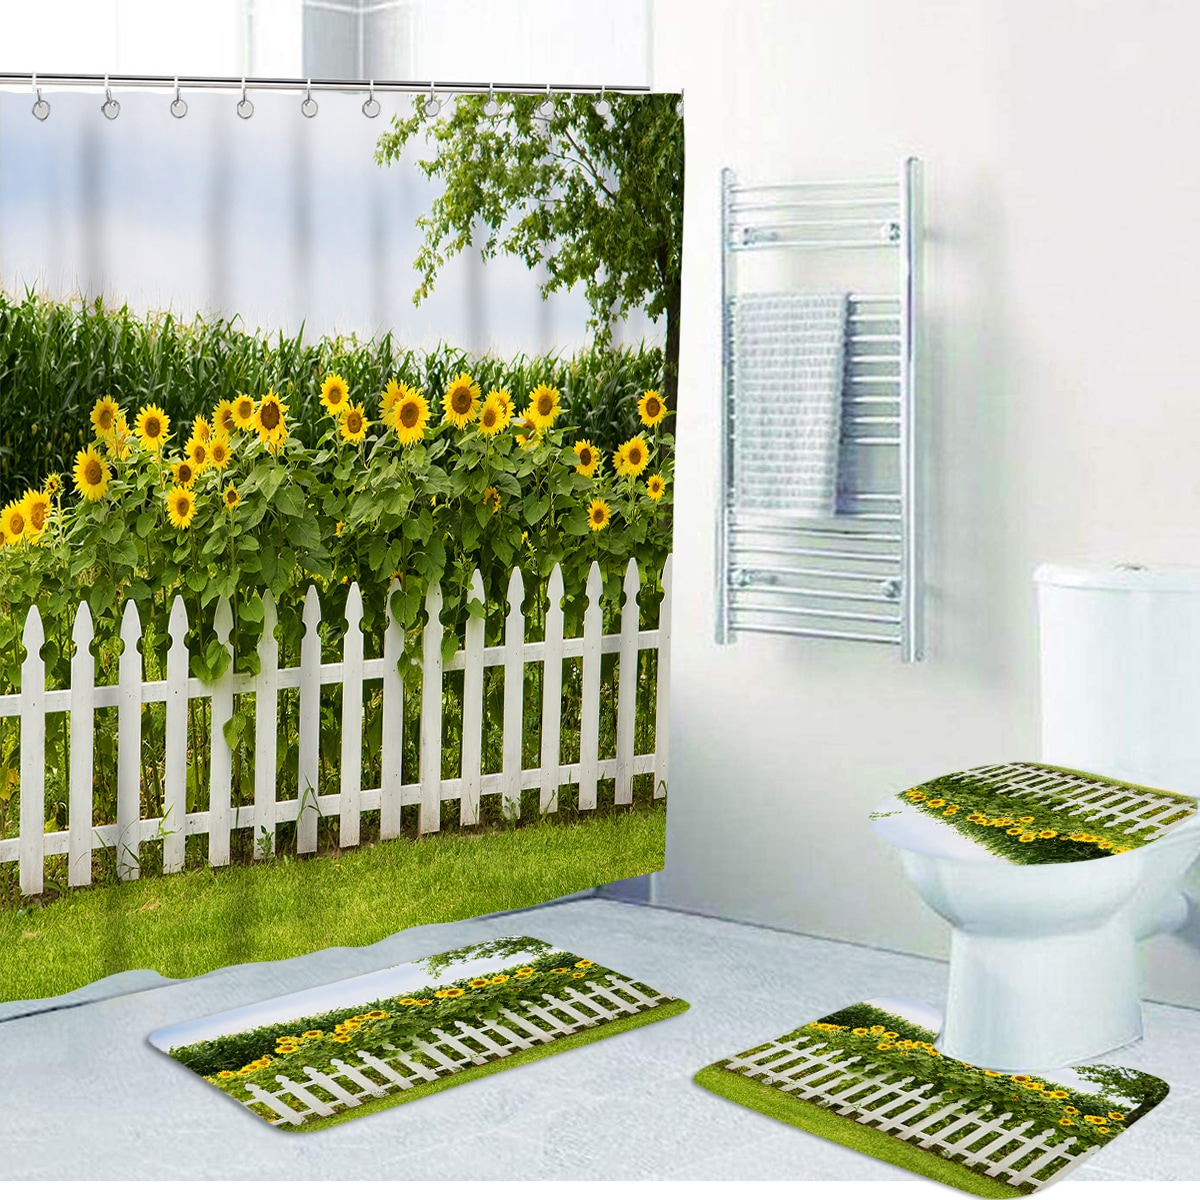 1 Stück rutschfeste Matte oder Duschvorhang mit Sonnenblumen Muster